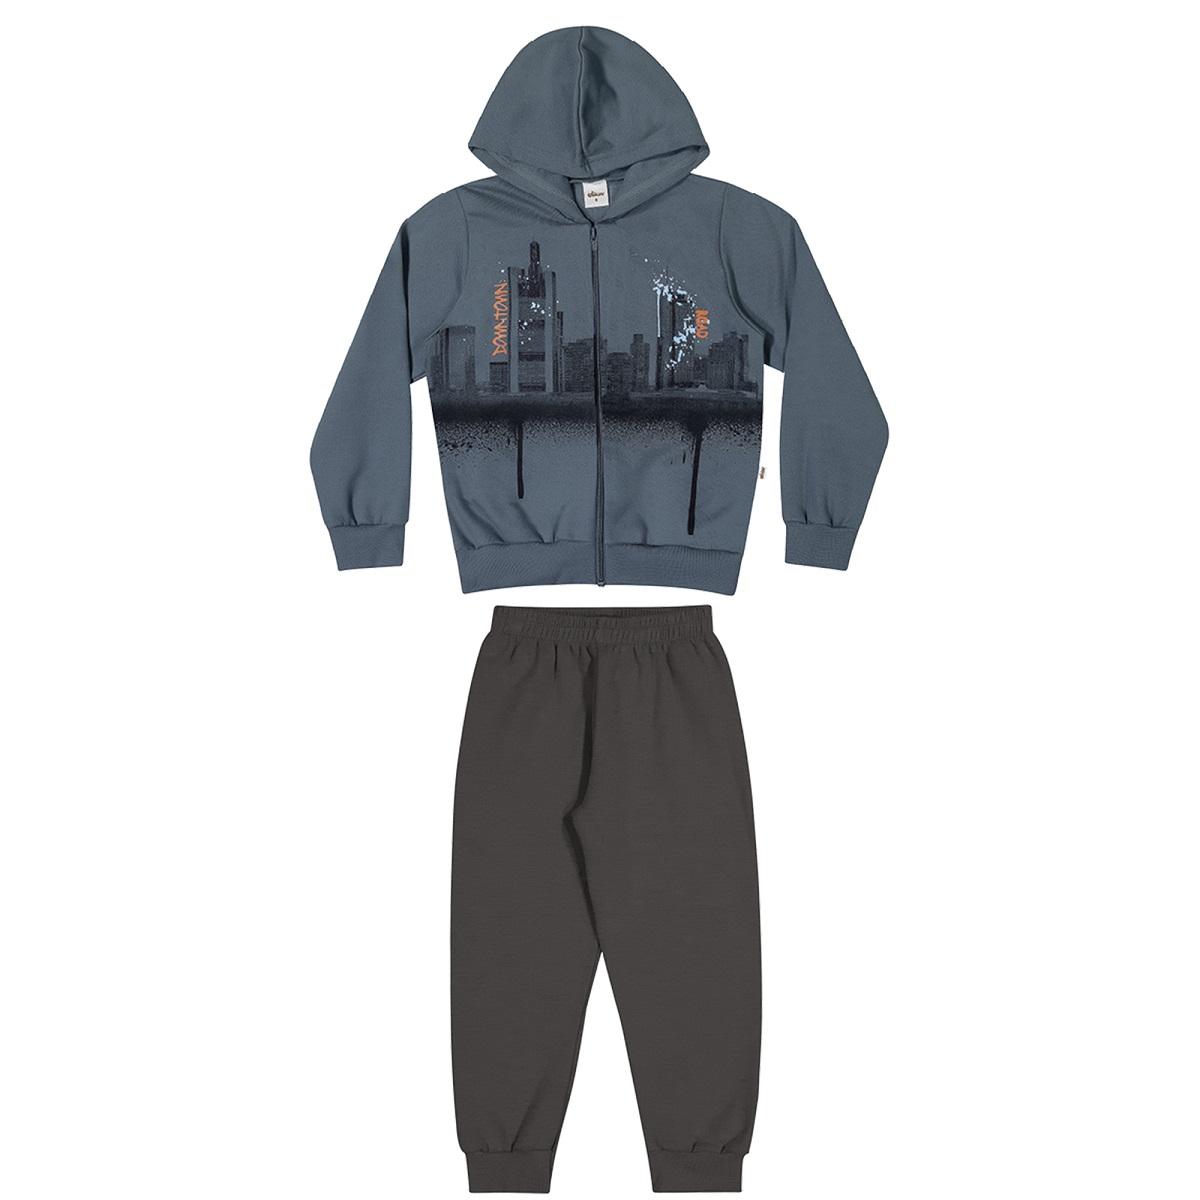 Conjunto Infantil Masculino Jaqueta e Calça -  ELIAN 241040